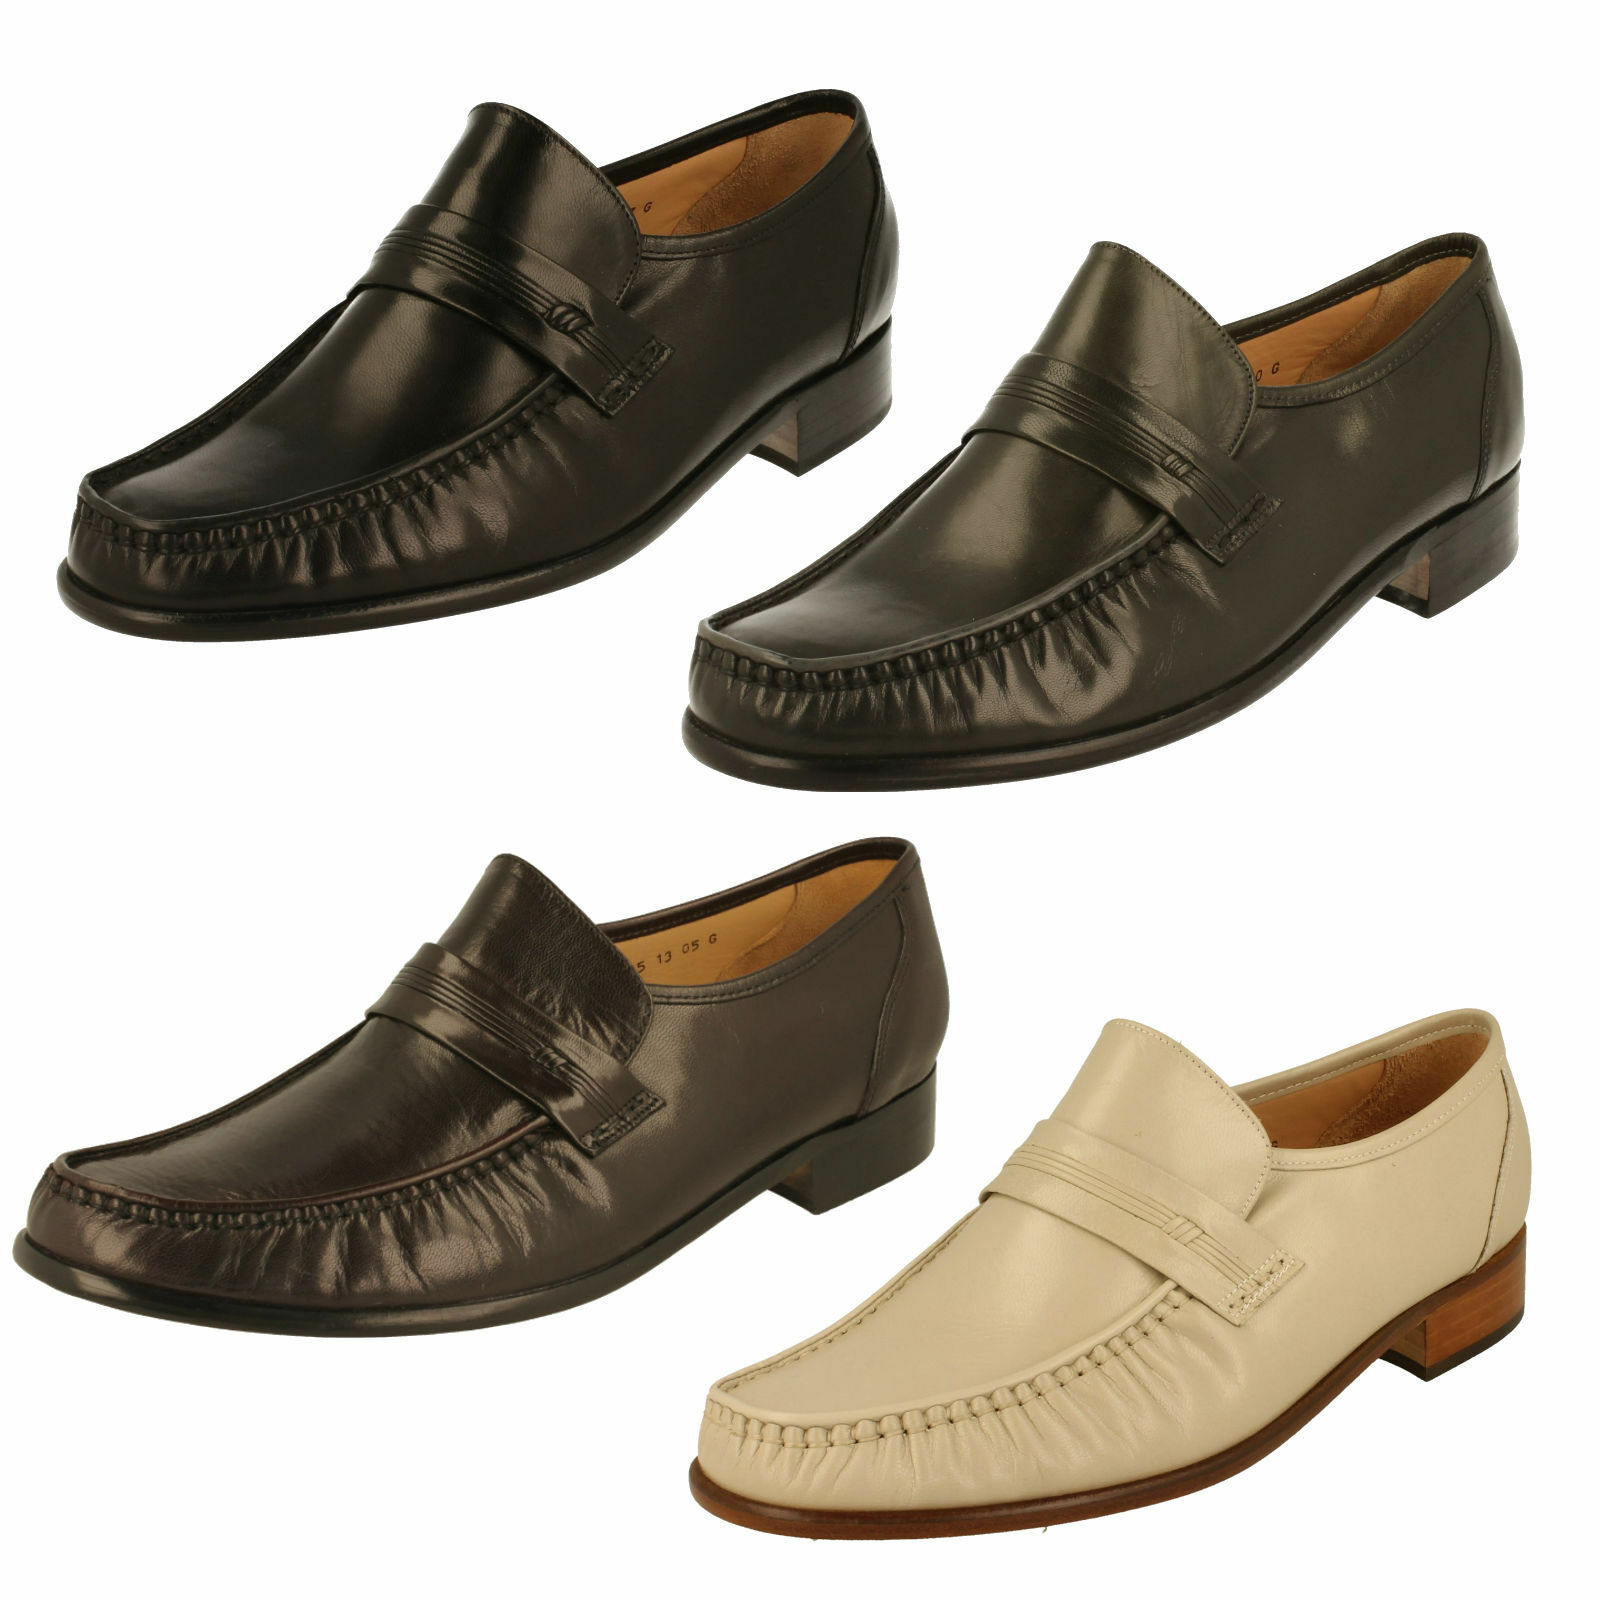 Men's Grenson Formal Moccasin Shoes - Clapham